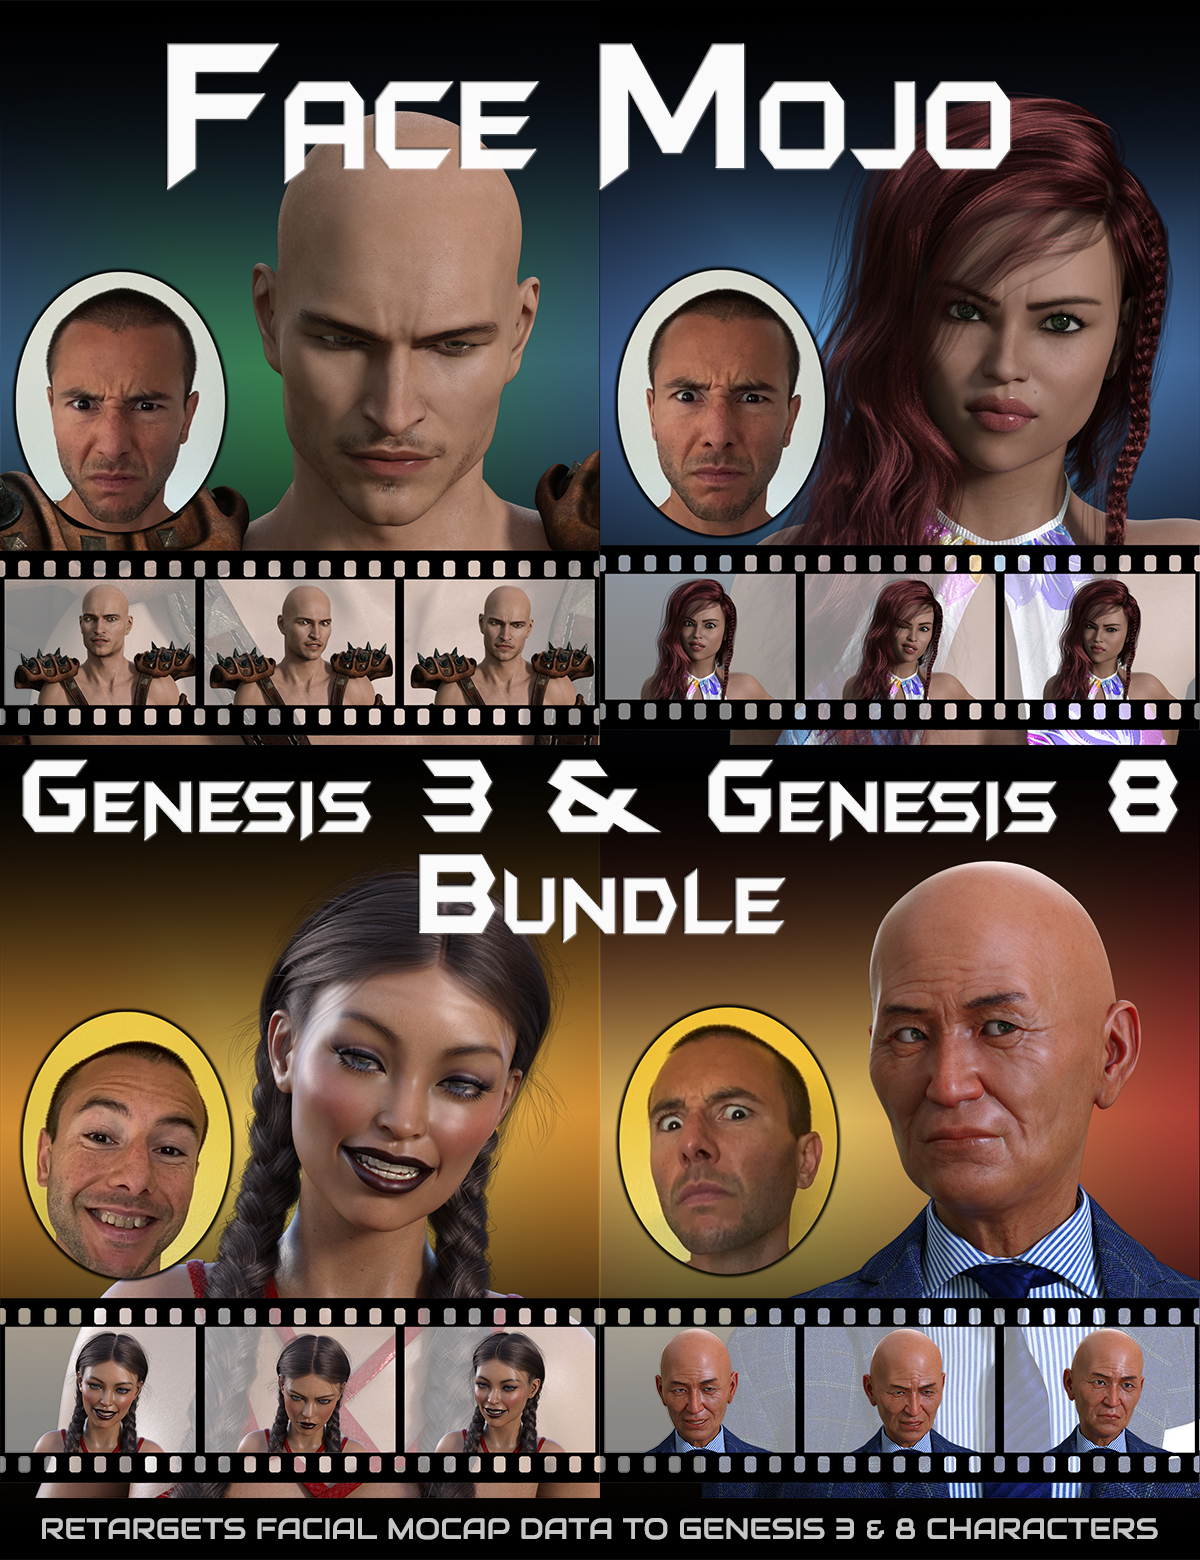 Face Mojo - Facial MoCap Retargeting - Genesis 3 and 8 Bundle by: LayLo 3D, 3D Models by Daz 3D